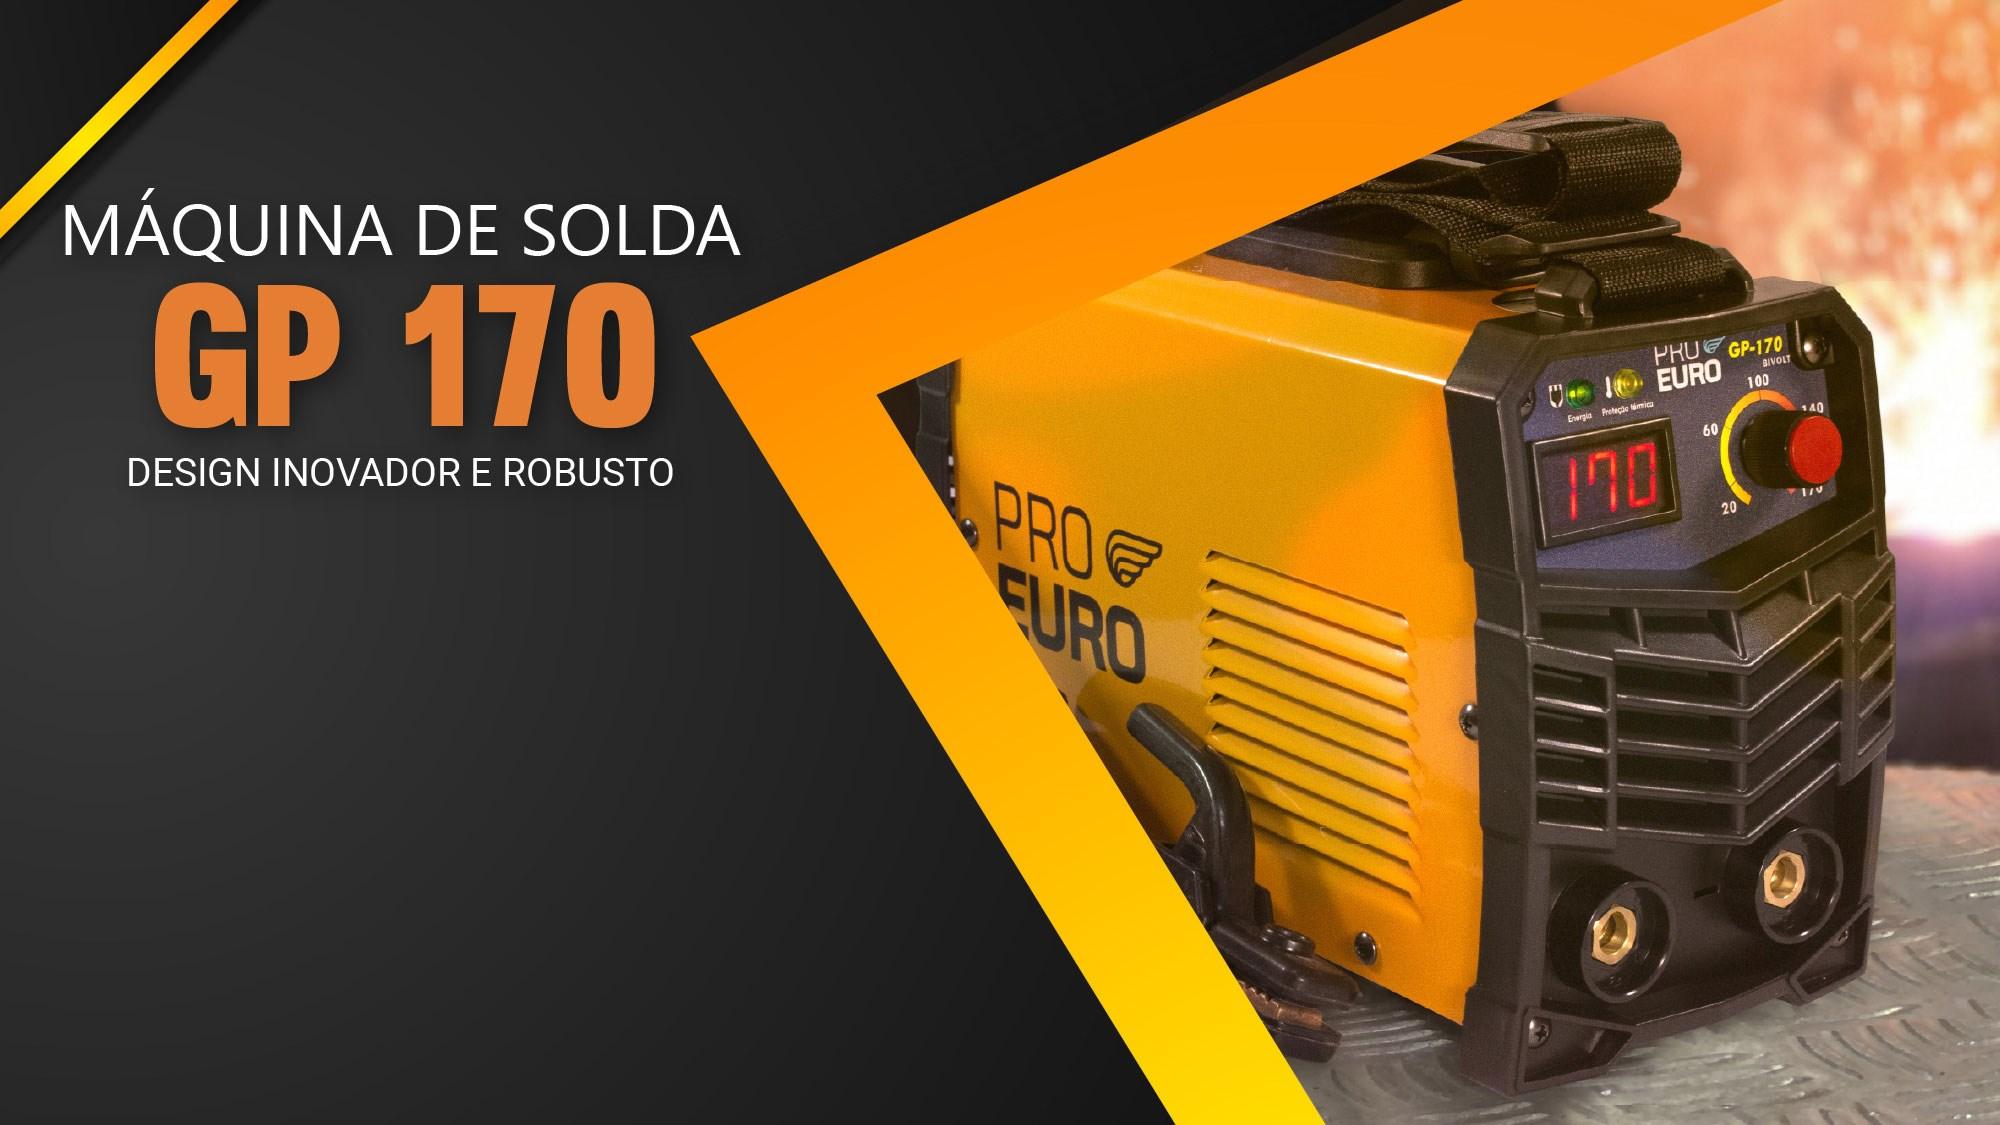 GP 170 - Pró Euro